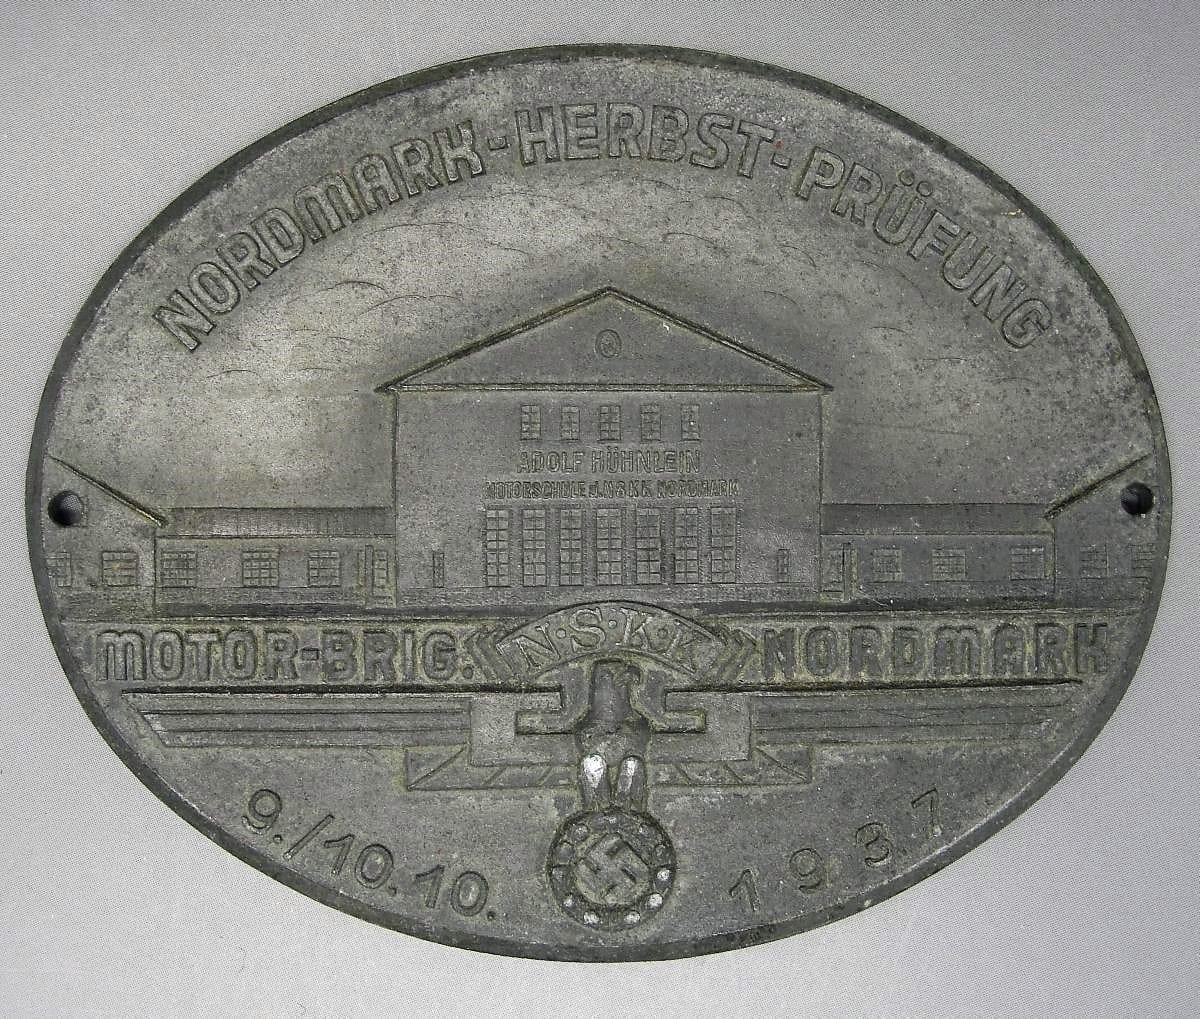 1937 NSKK Motor Brigade Nordmark Adolf Hitler School Table Medal